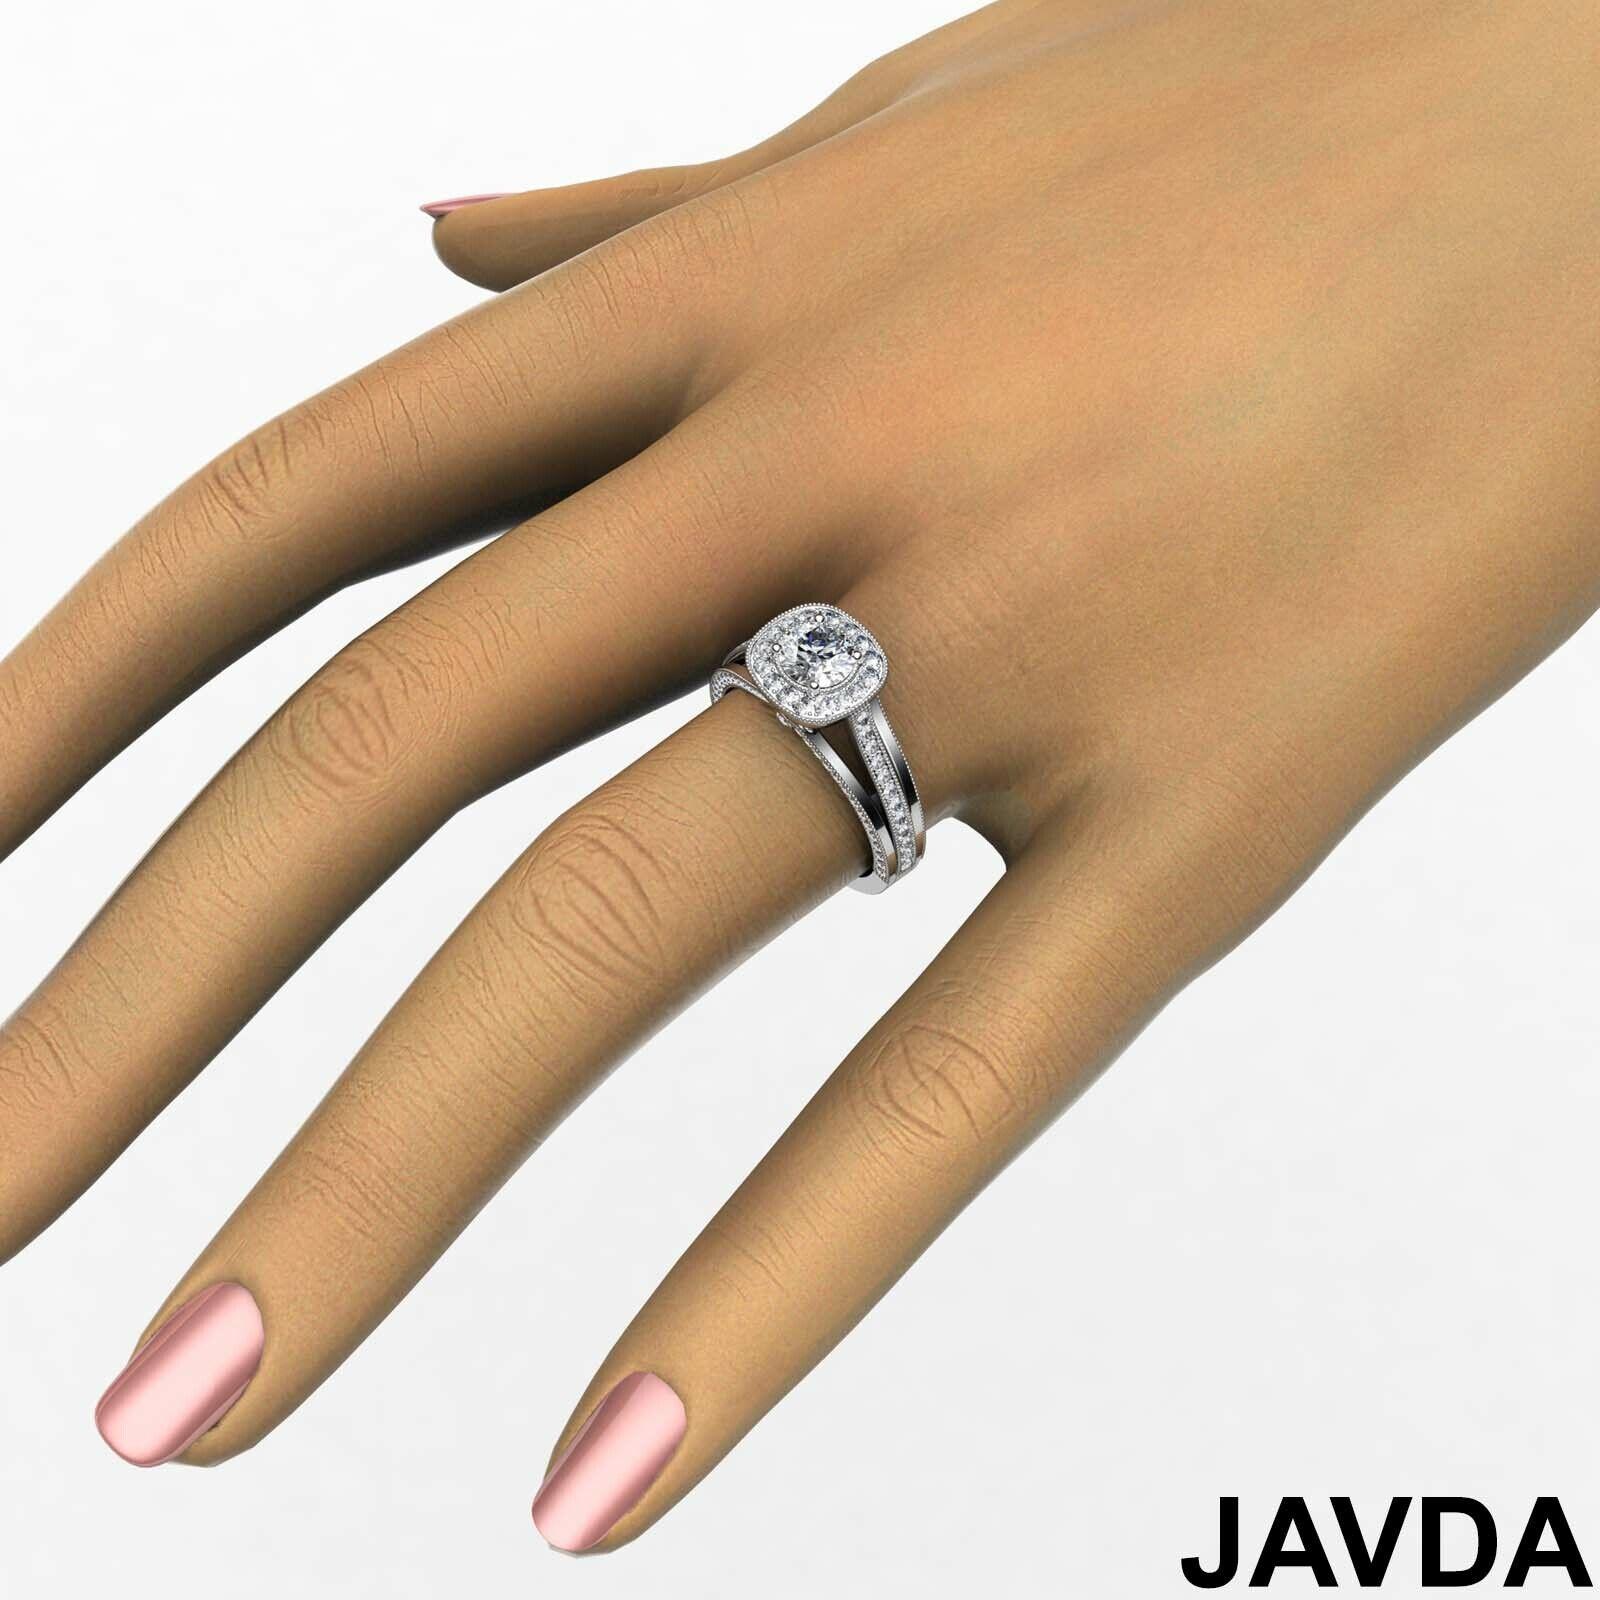 1.6ctw Bridge Accent Round Diamond Engagement Ring GIA E-VVS2 White Gold Rings 3